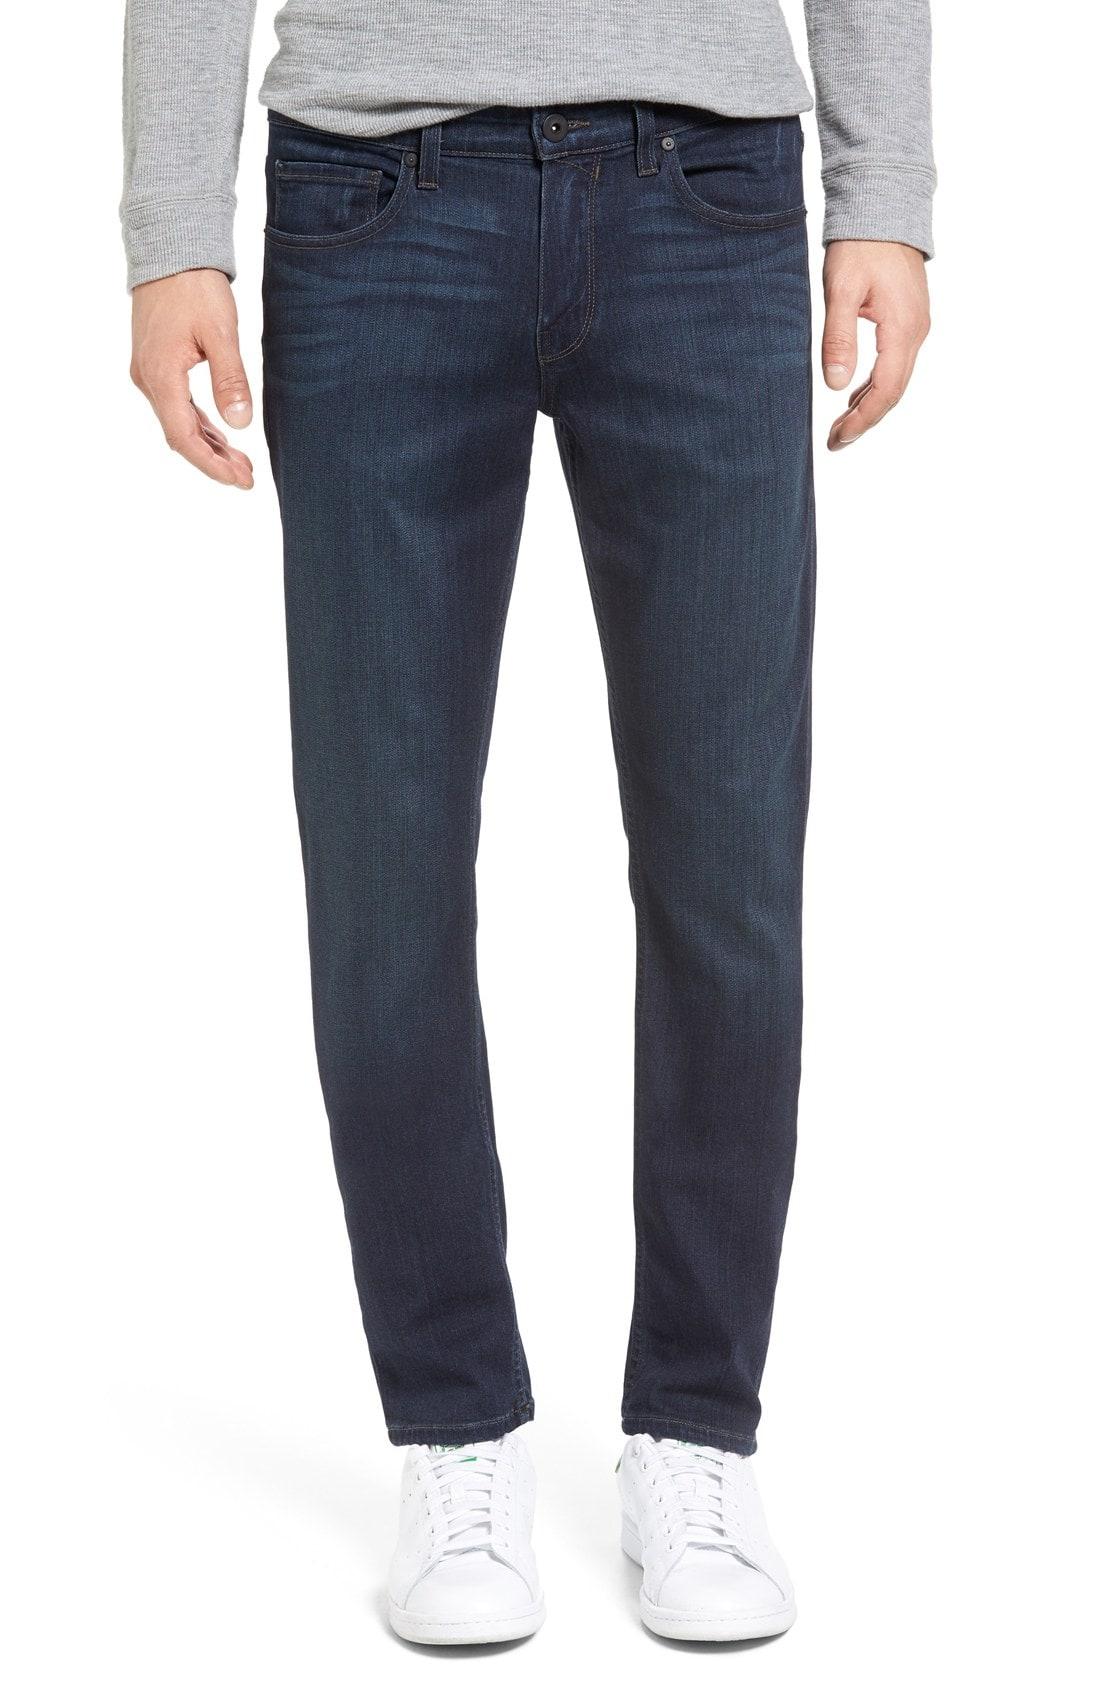 PAIGE Transcend - Croft Skinny Fit Jeans (After Hours)